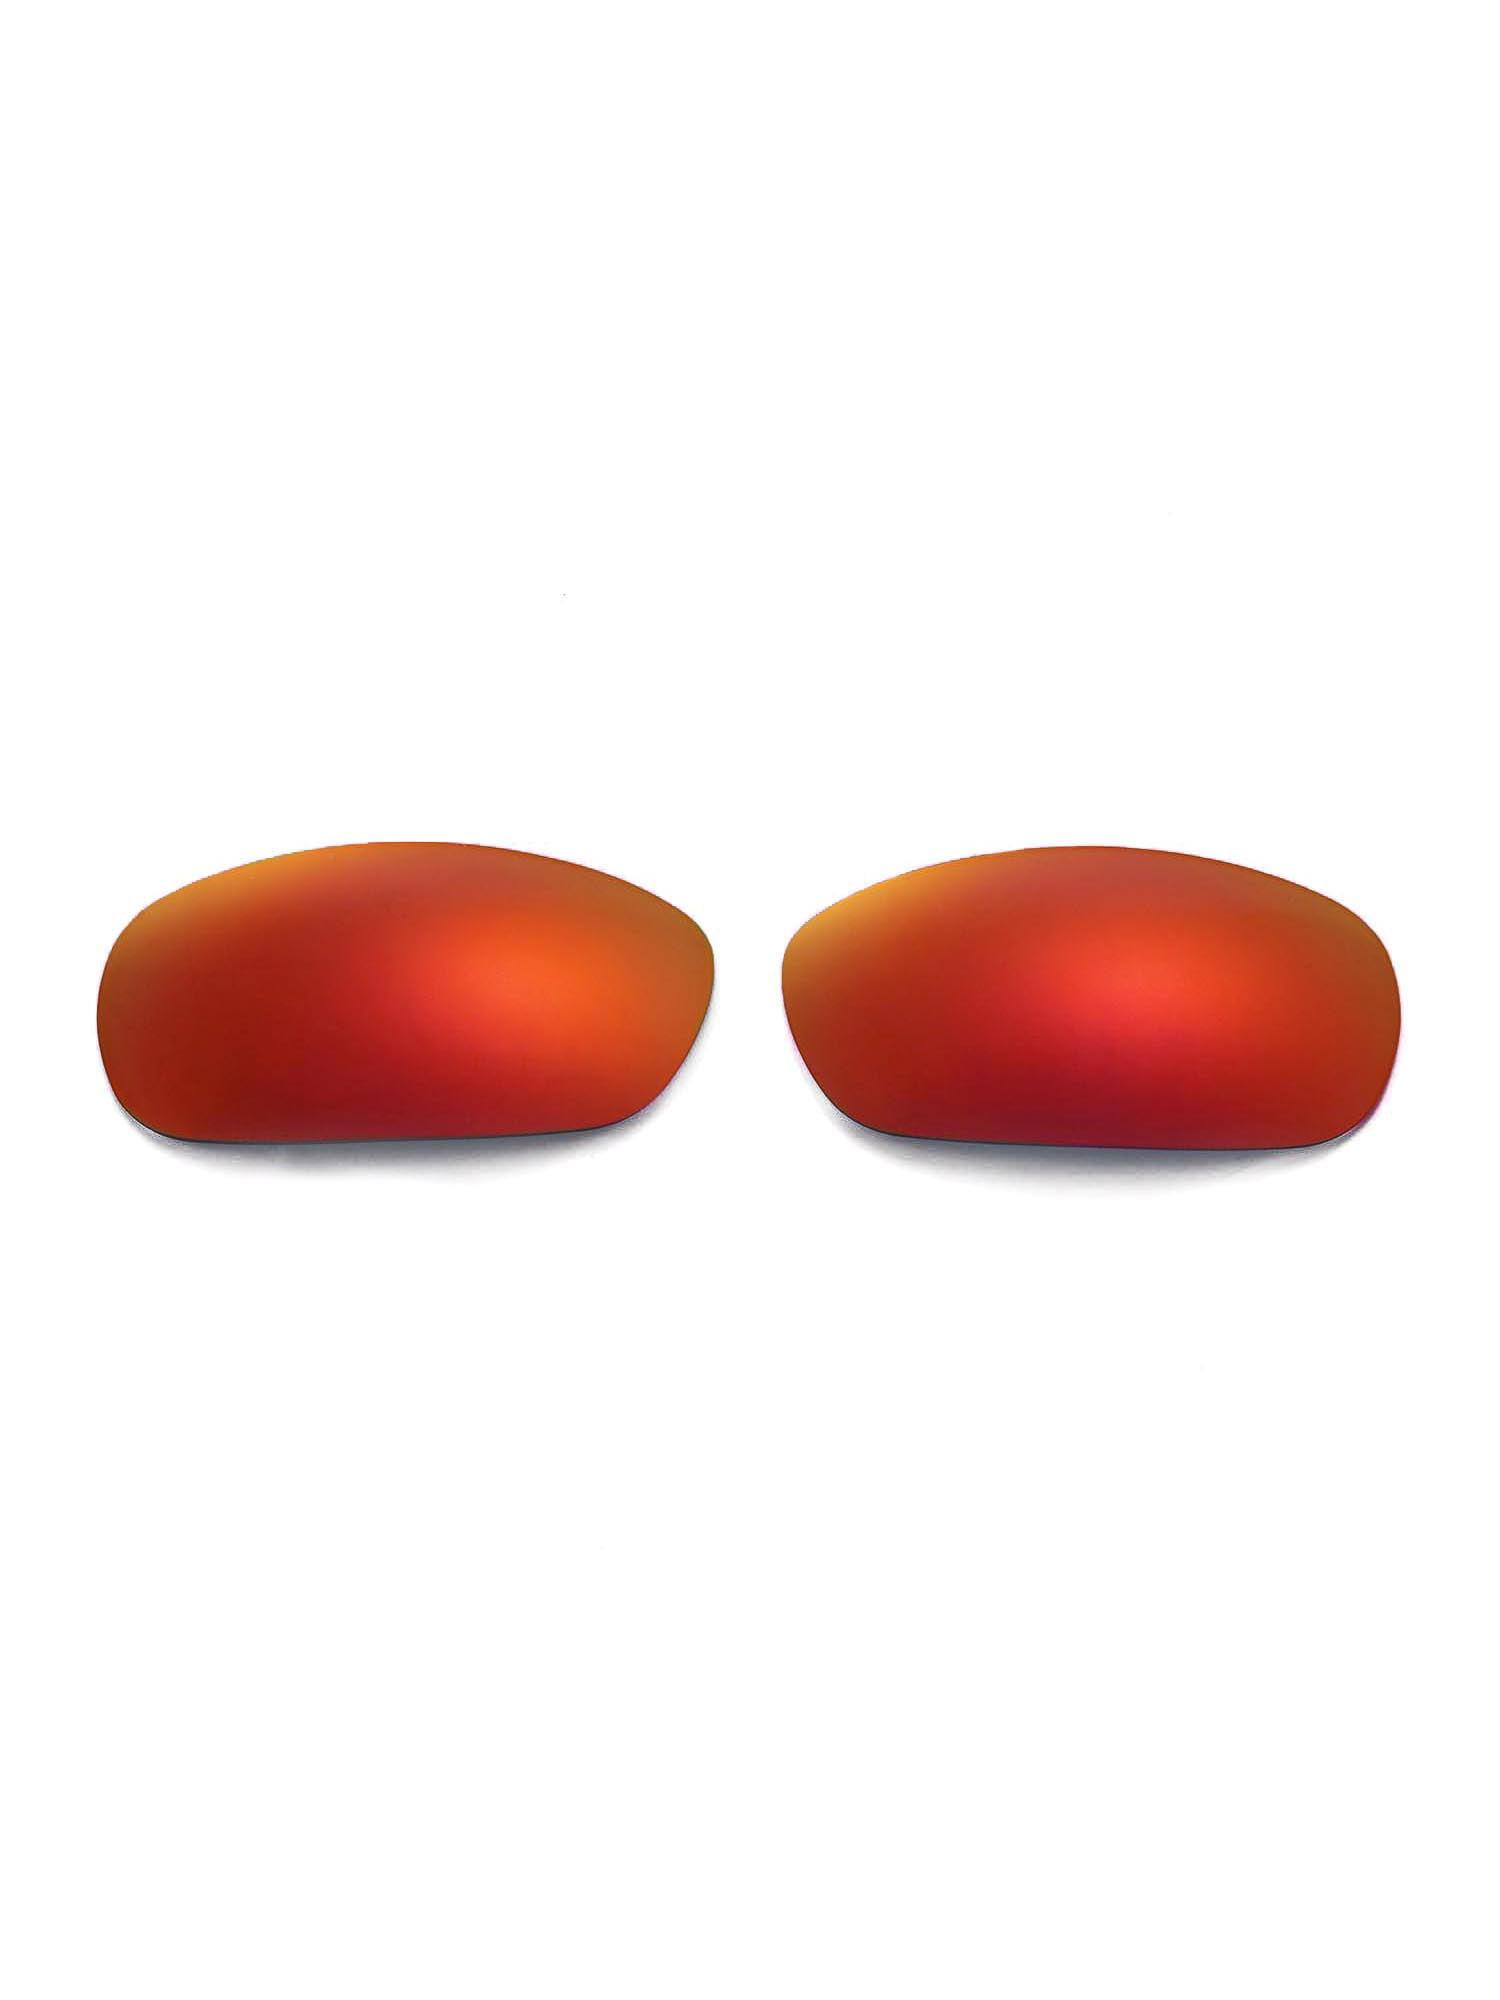 bd1507f693135 Walleva Brown Polarized Replacement Lenses for Costa Del Mar Brine  Sunglasses - Walmart.com